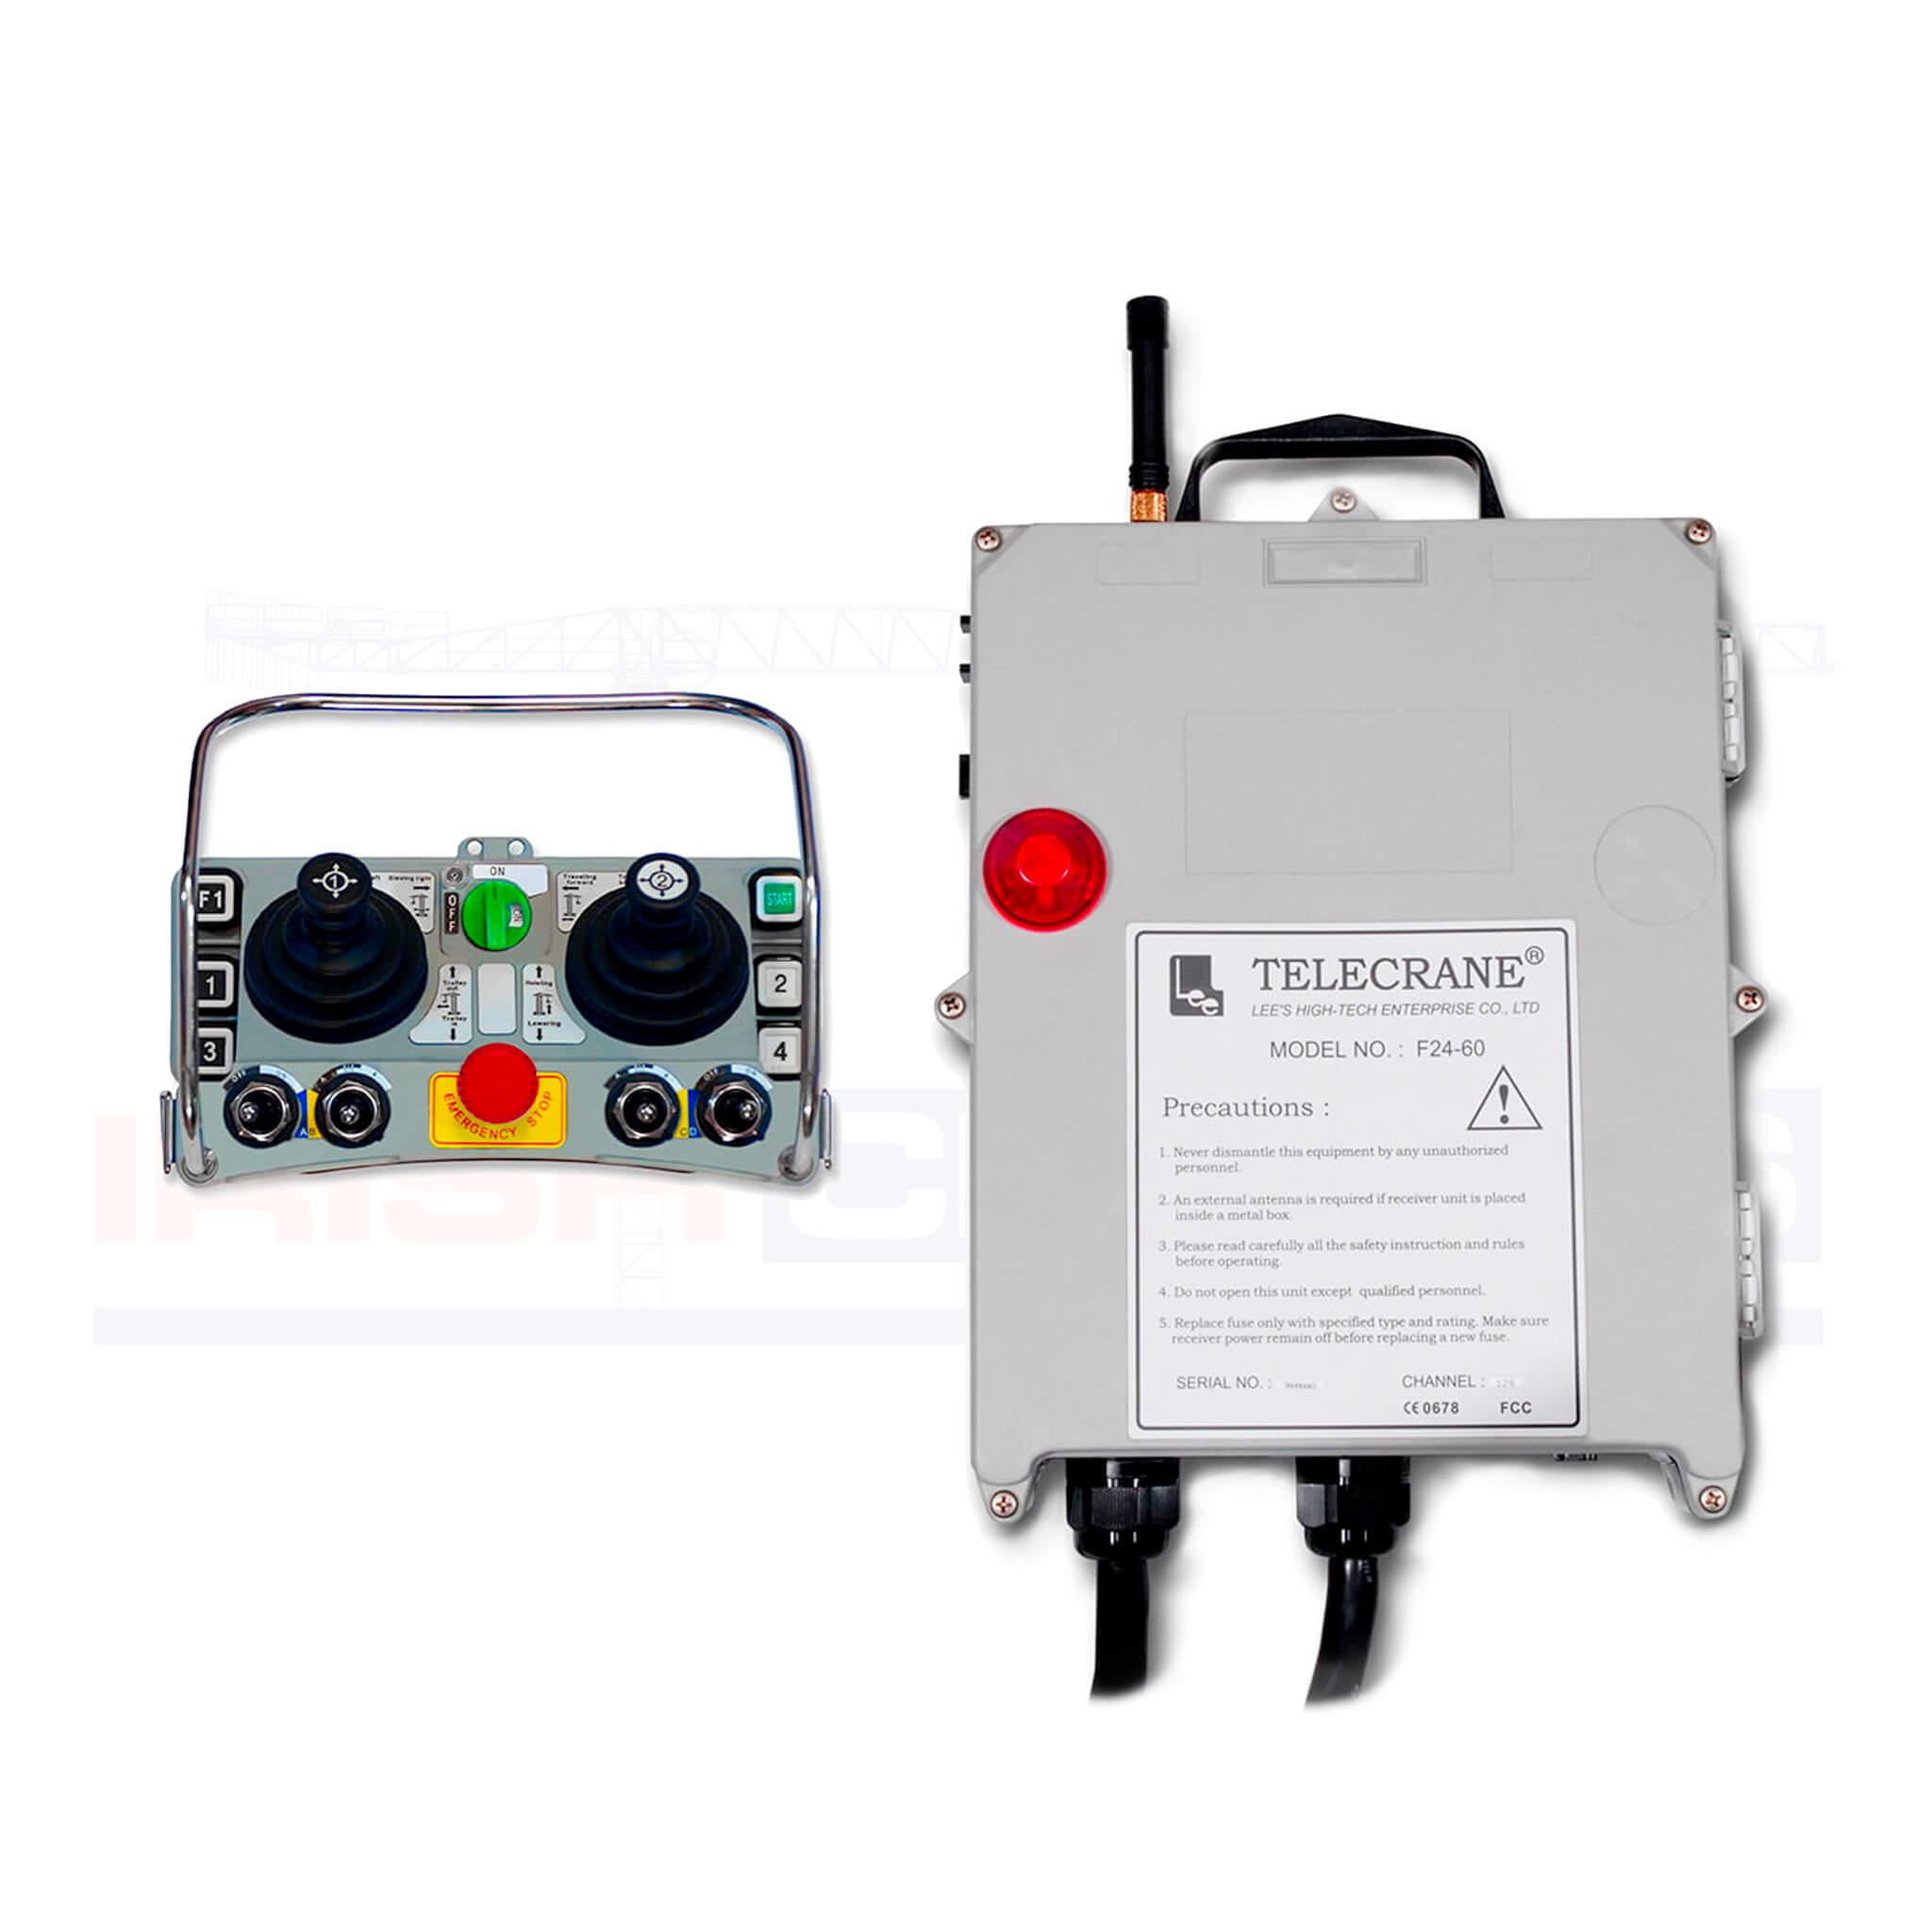 Silver JOY F24 60 PLL remote control